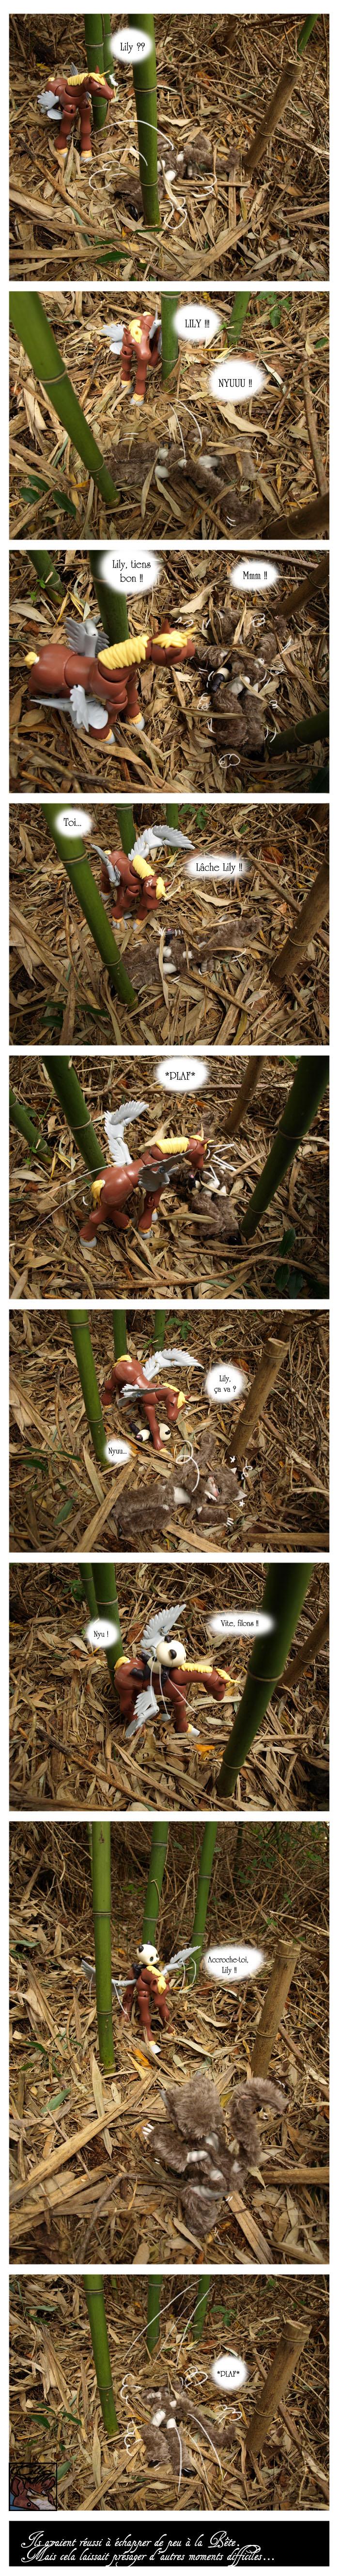 [Heika's 3] Pauvre Noël JOYEUX NOEL - Page 2 The_attack_part_2_by_monsieur_cheval-d88quw0